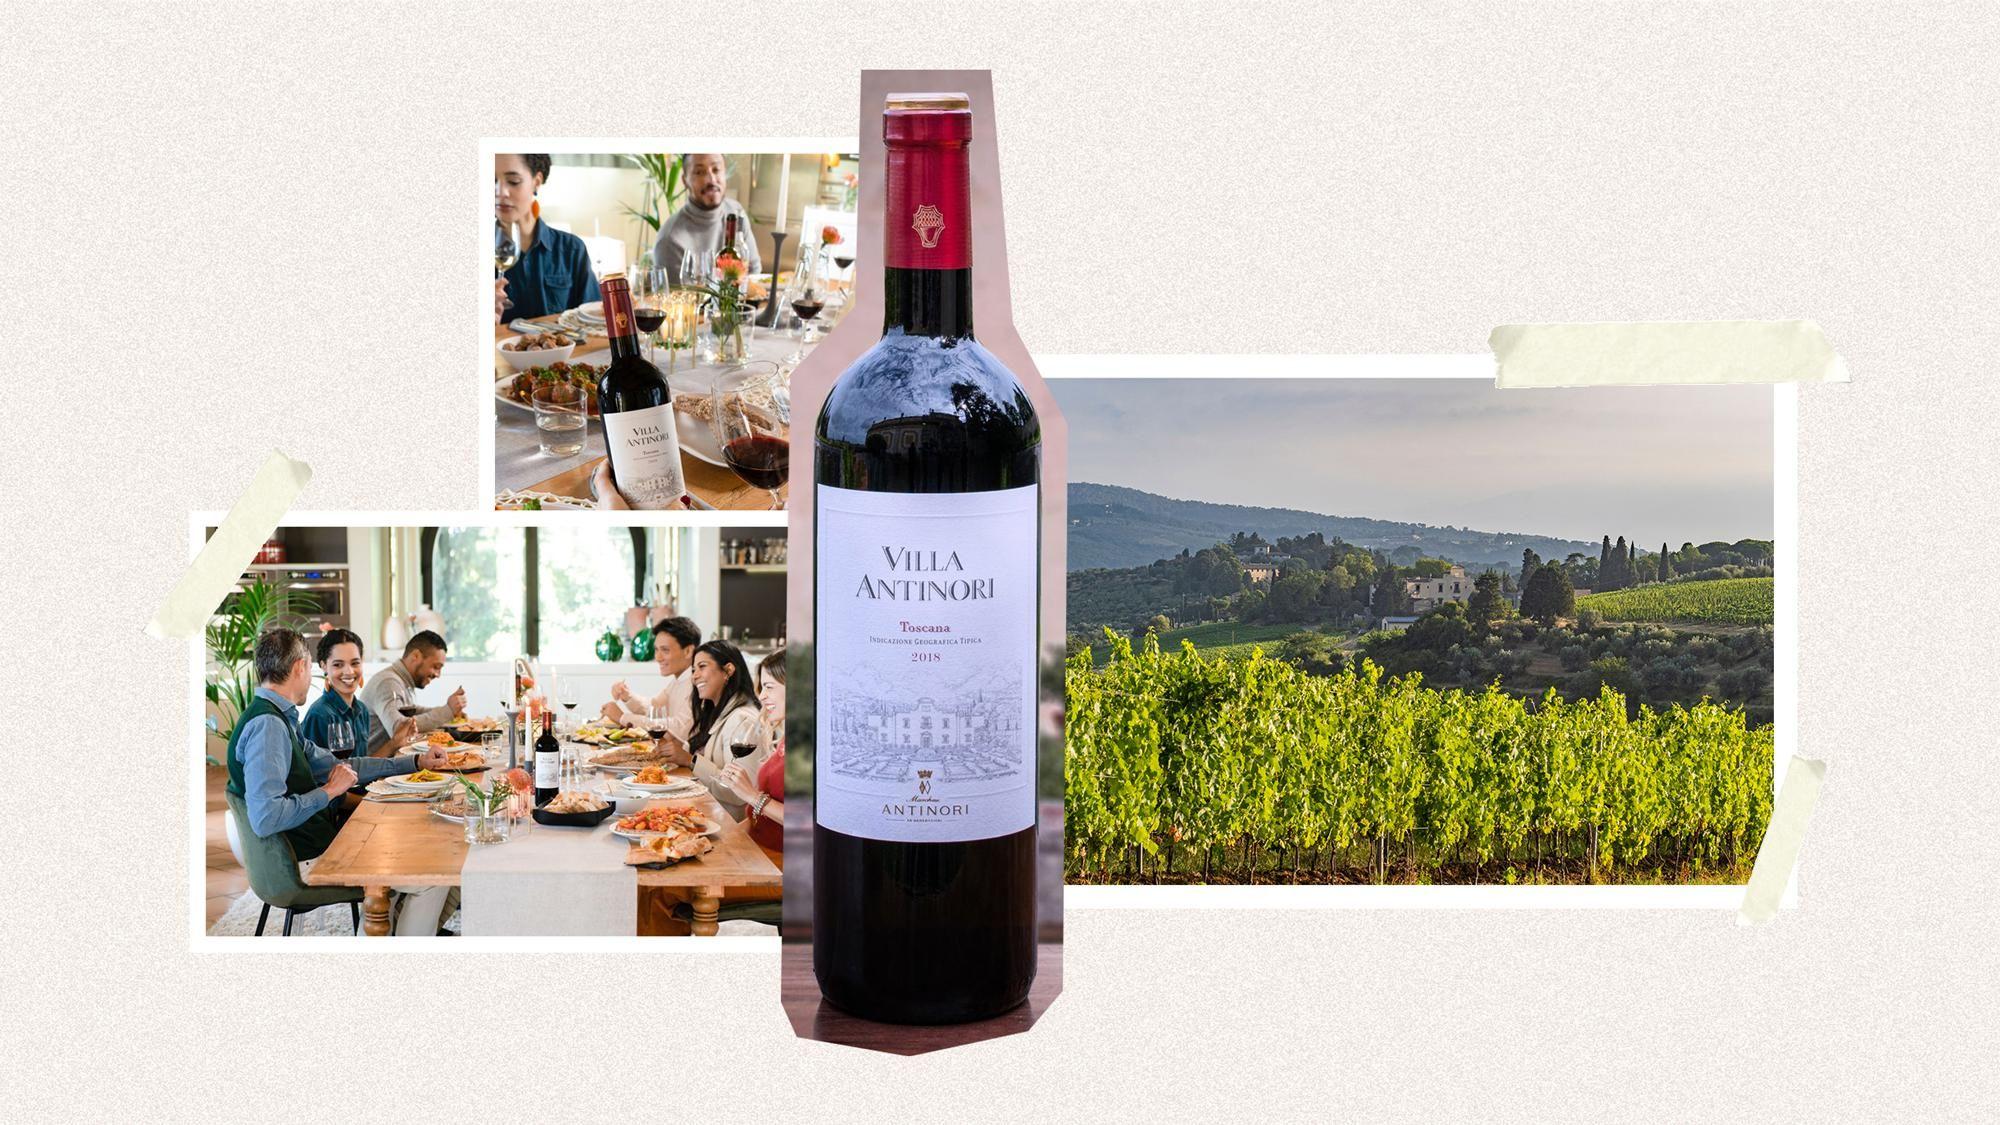 villa antinori wine